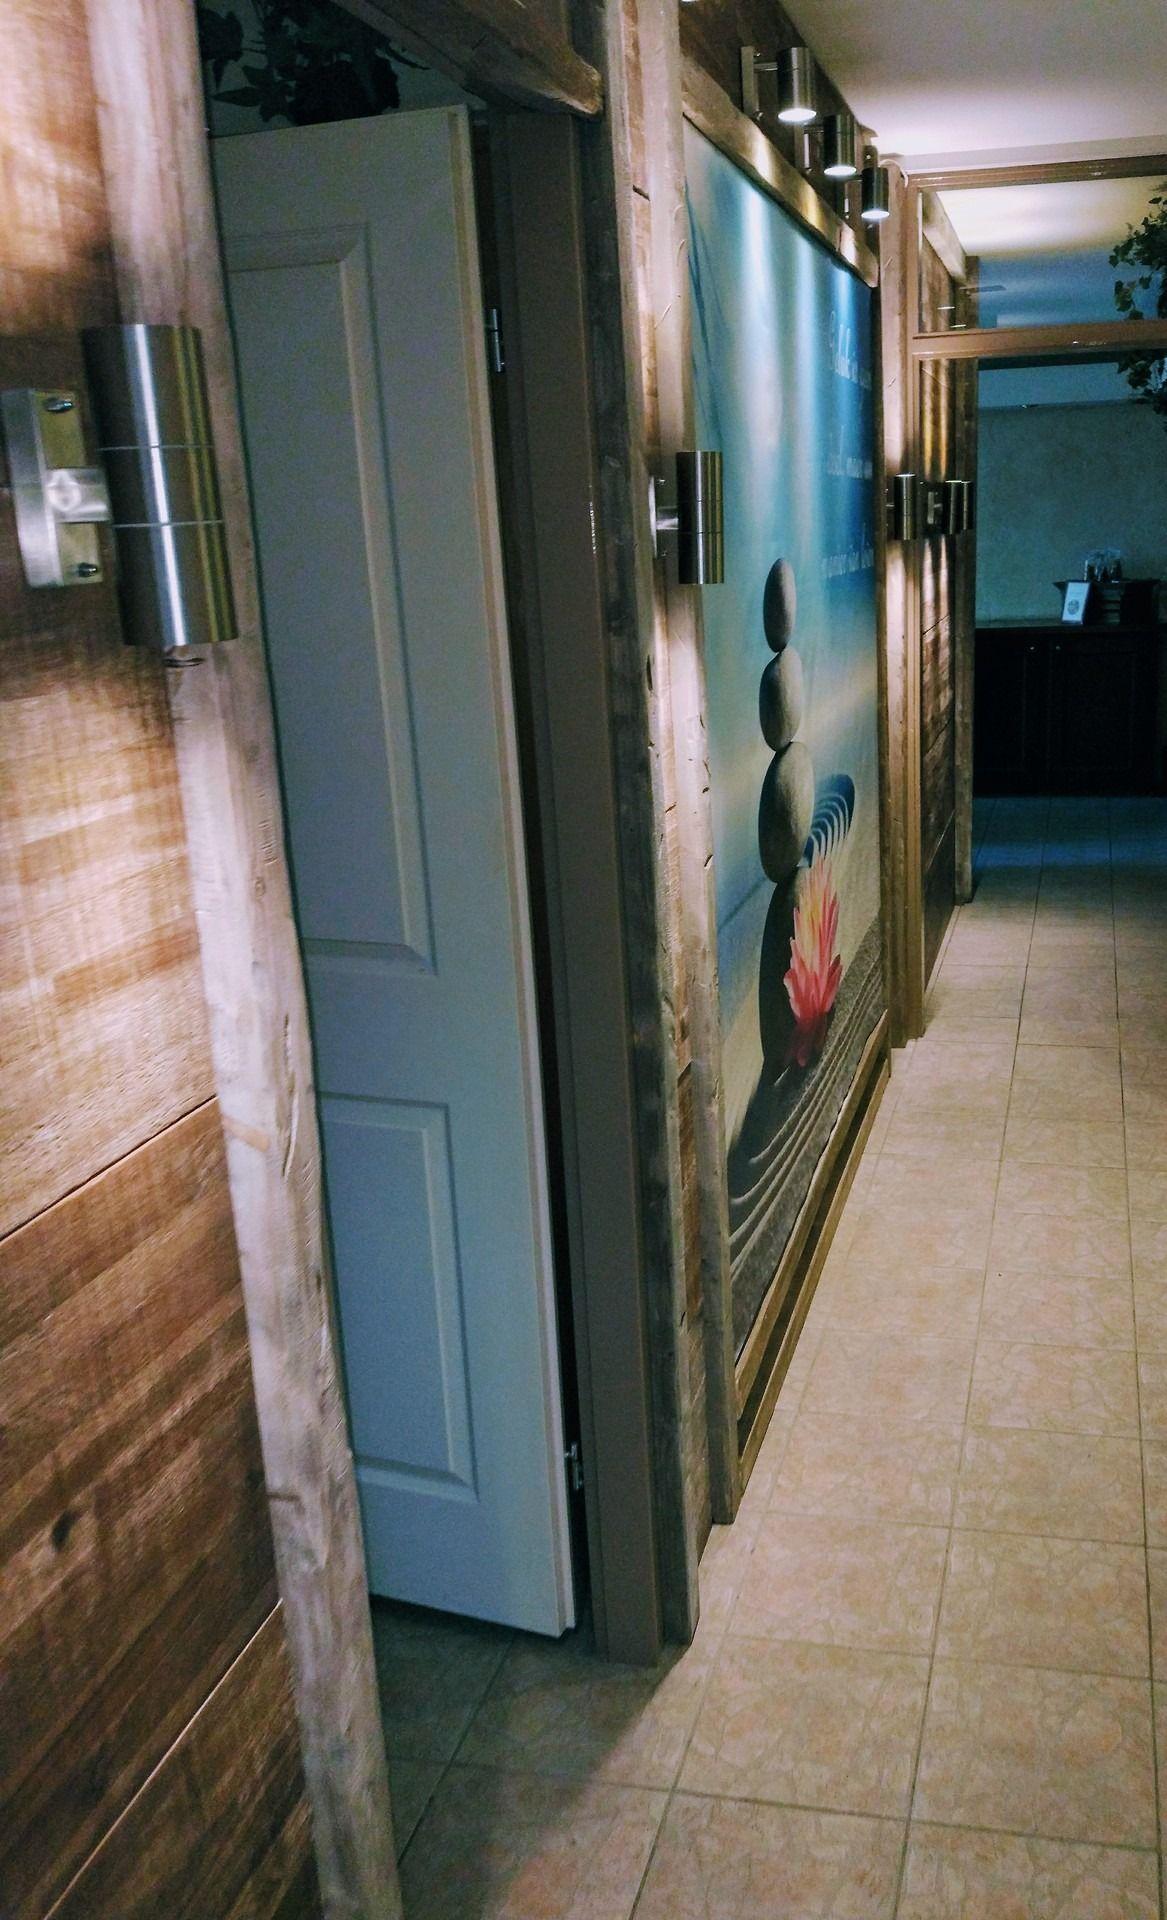 Home Sauna Kits Since 1974 anne mabellon (amabellon) on pinterest